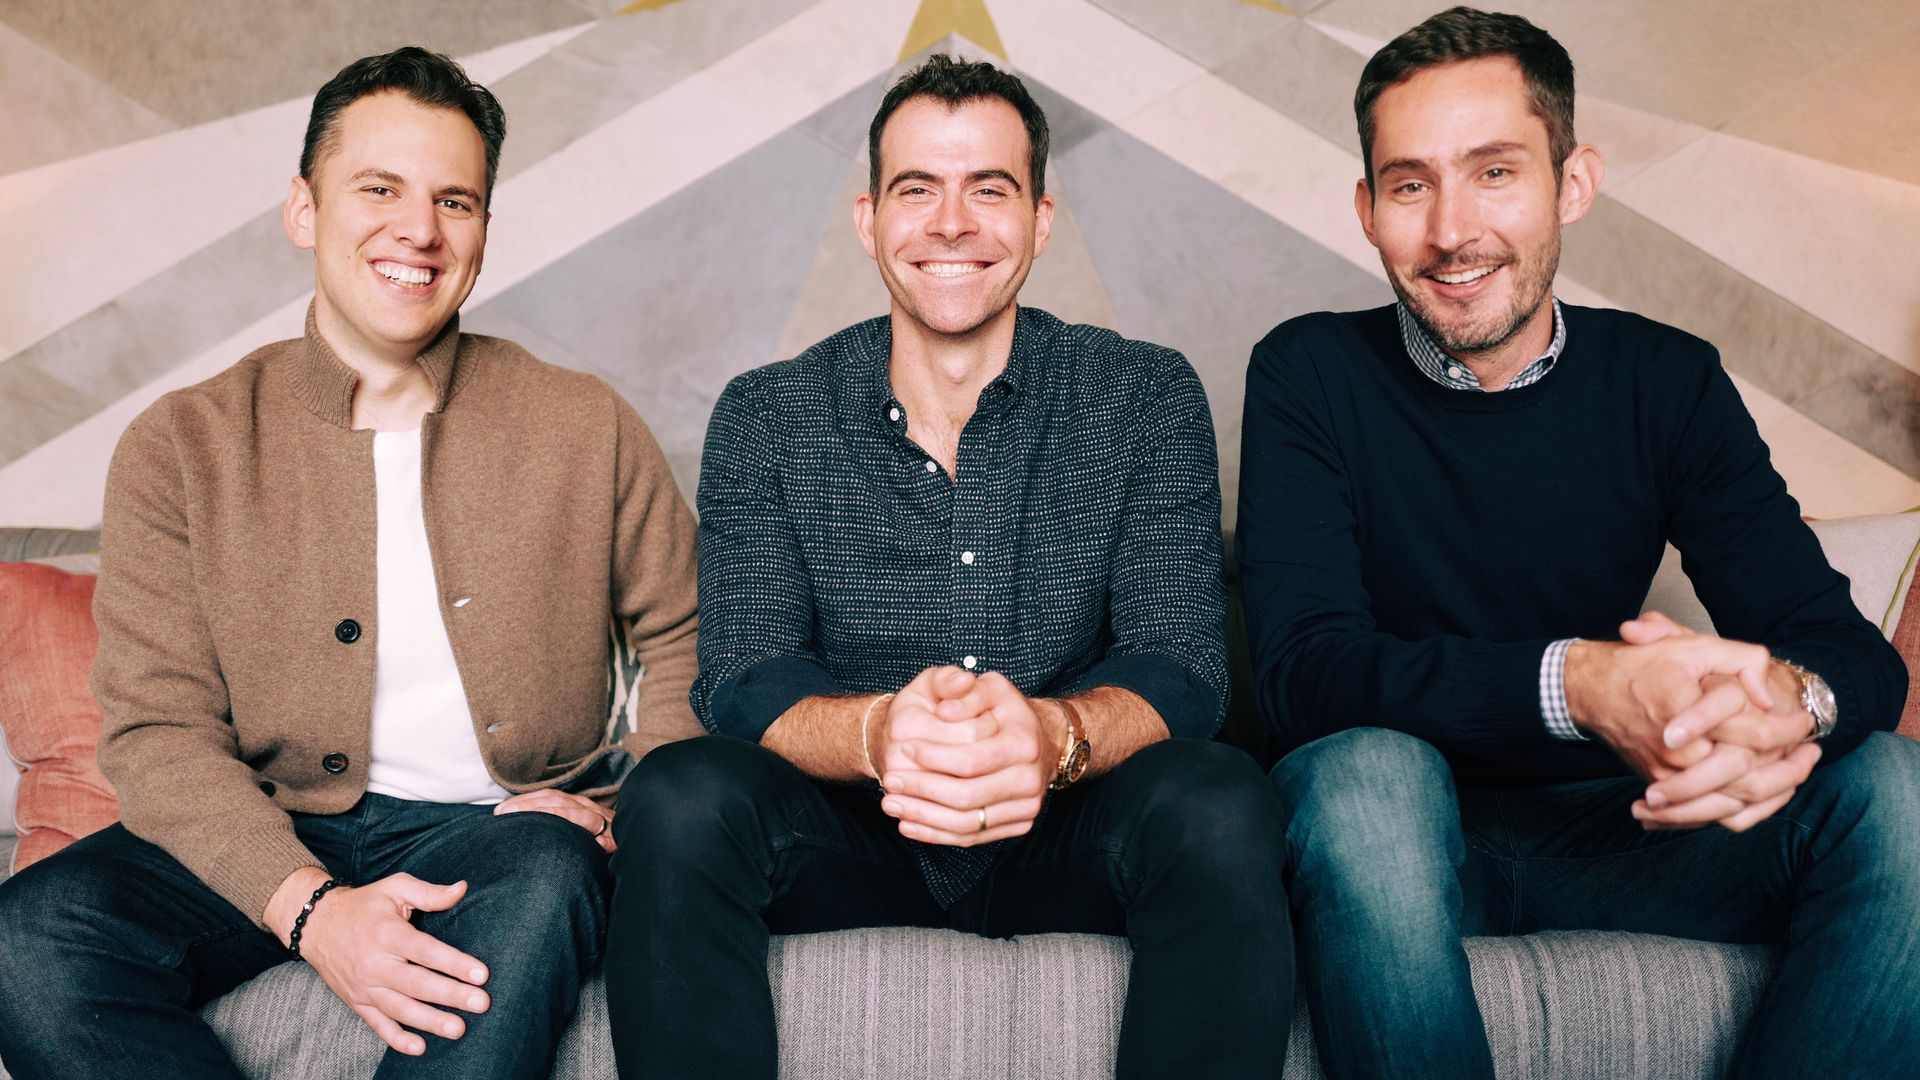 Mike Krieger, Adam Mosseri, Kevin Systrom